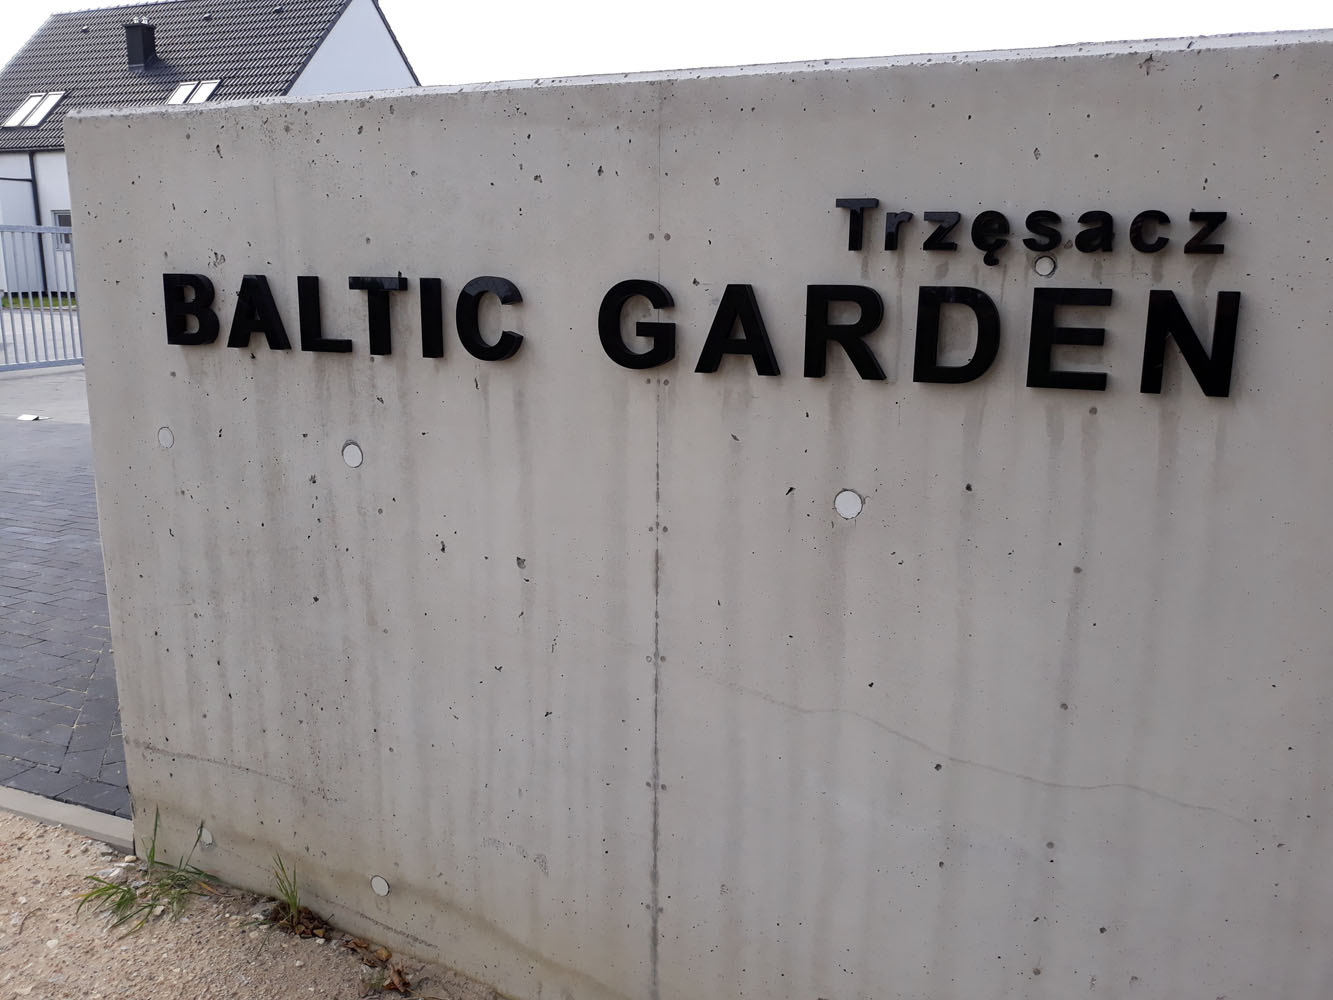 BALTIC GARDEN TRZĘSACZ (11)